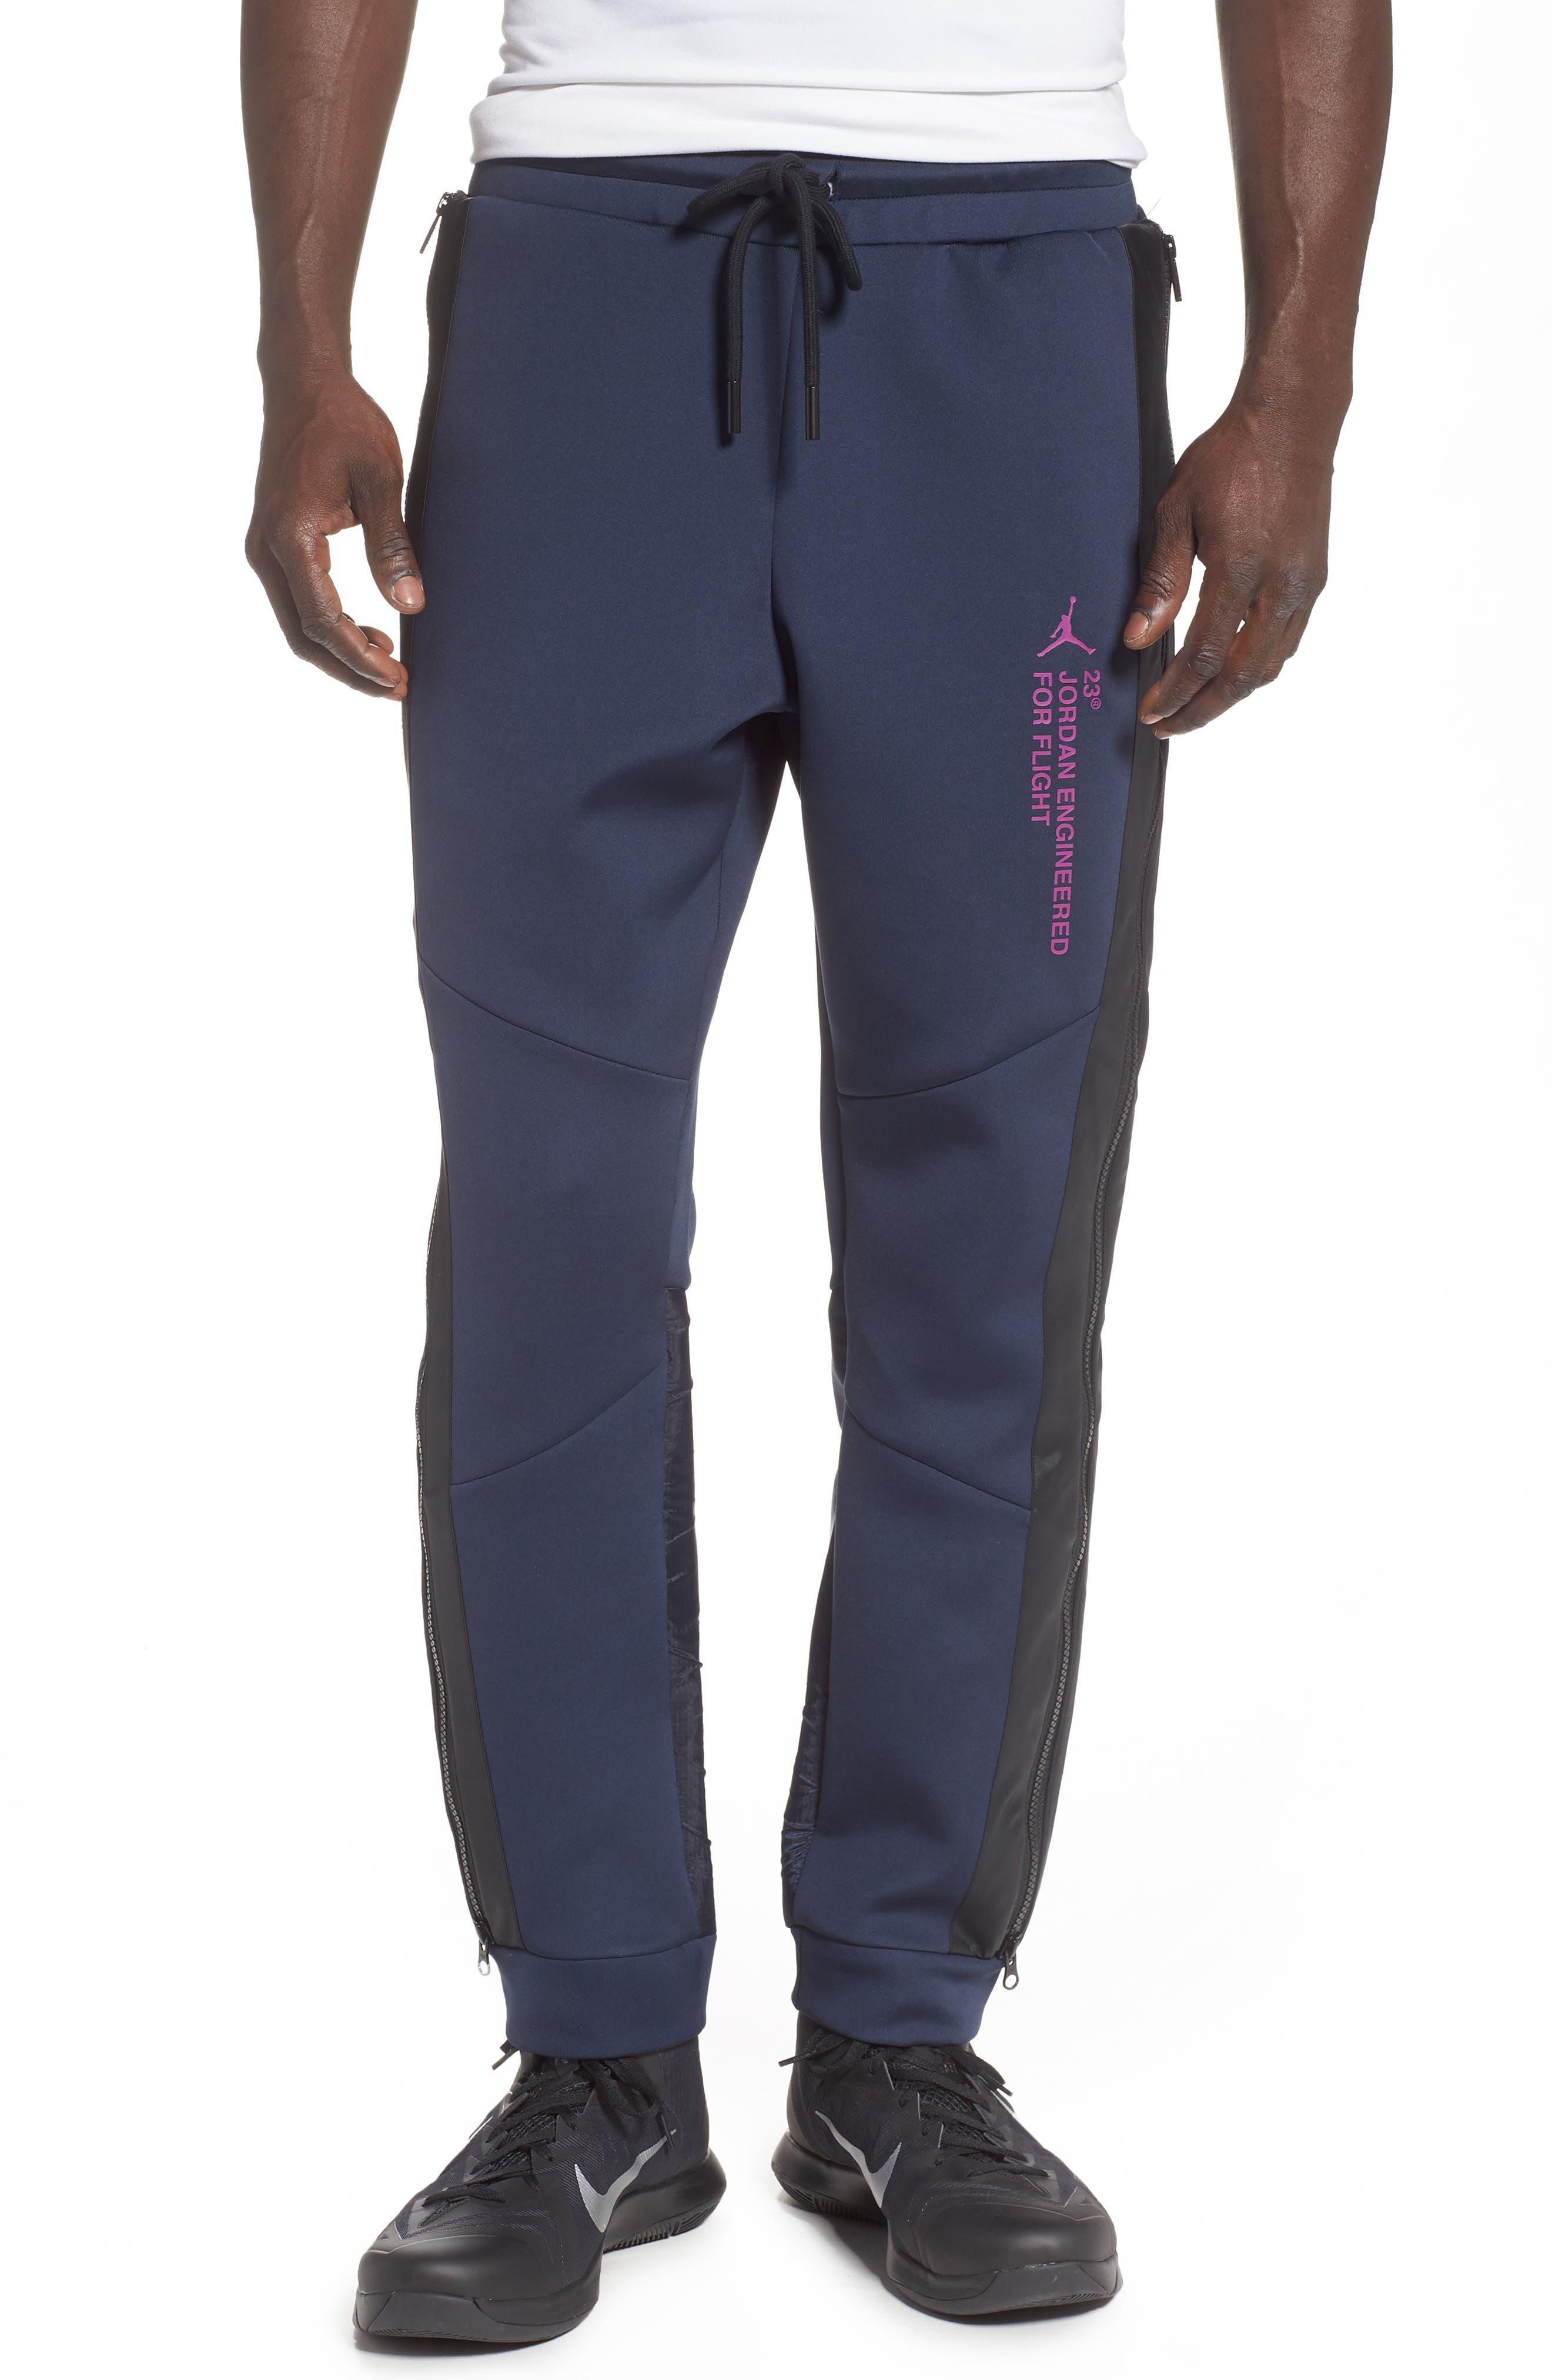 Jordan 23 Engineered Sweatpants, Blue